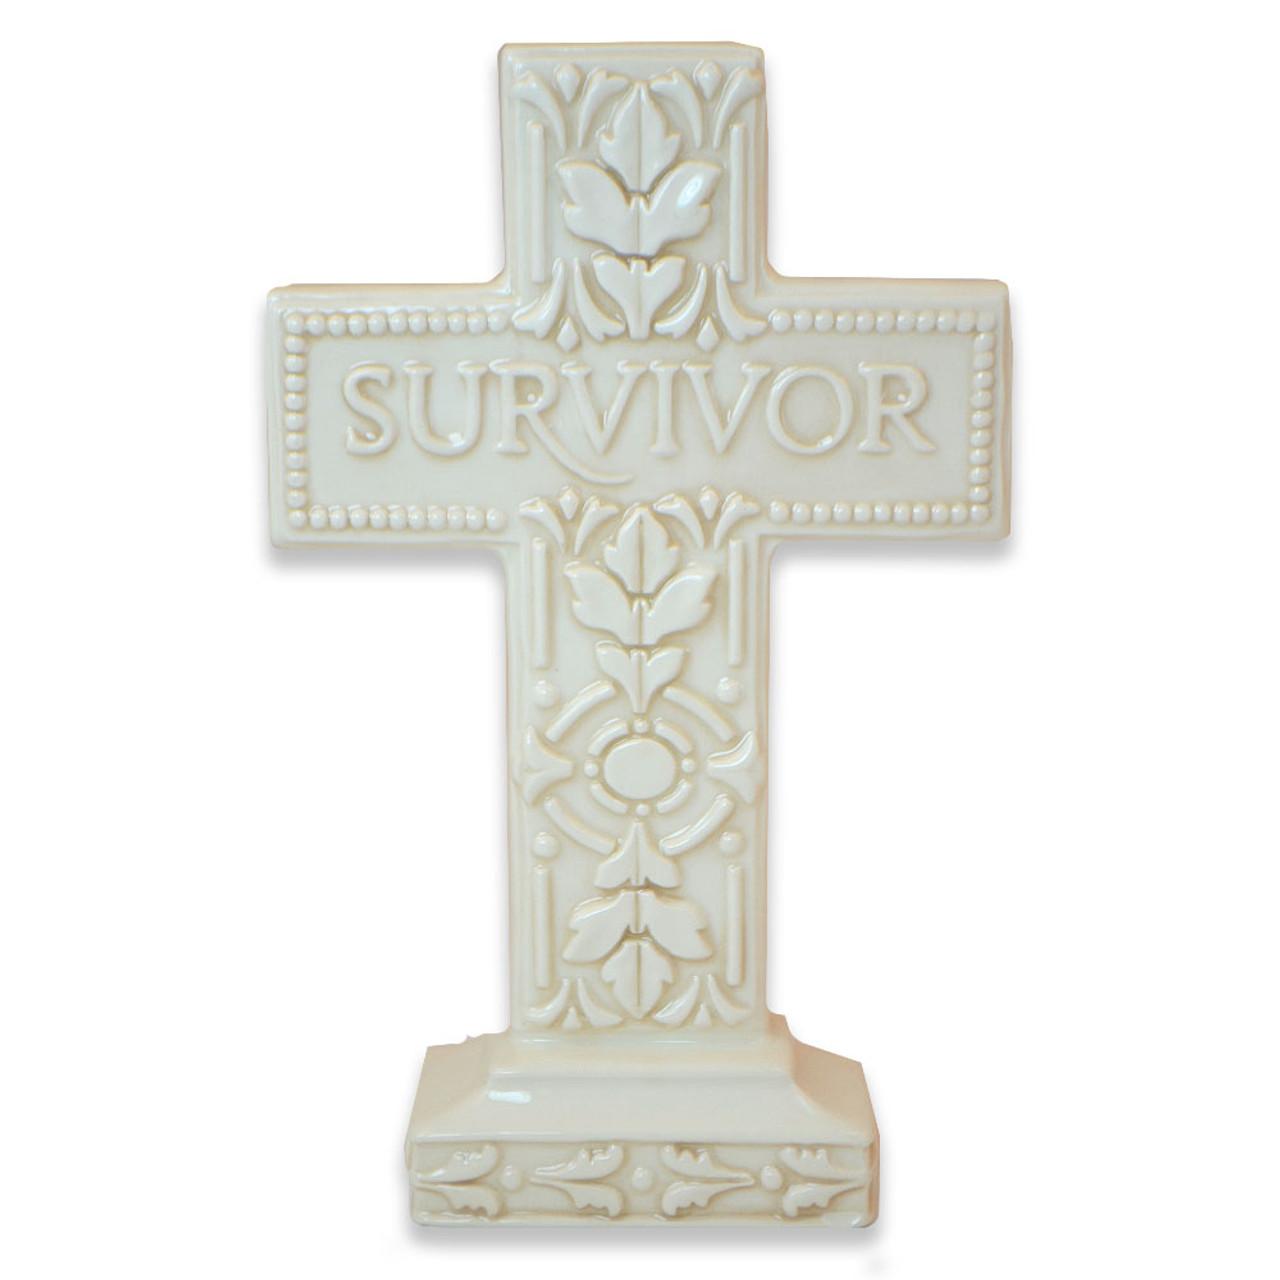 Survivor's Table Cross 6IN